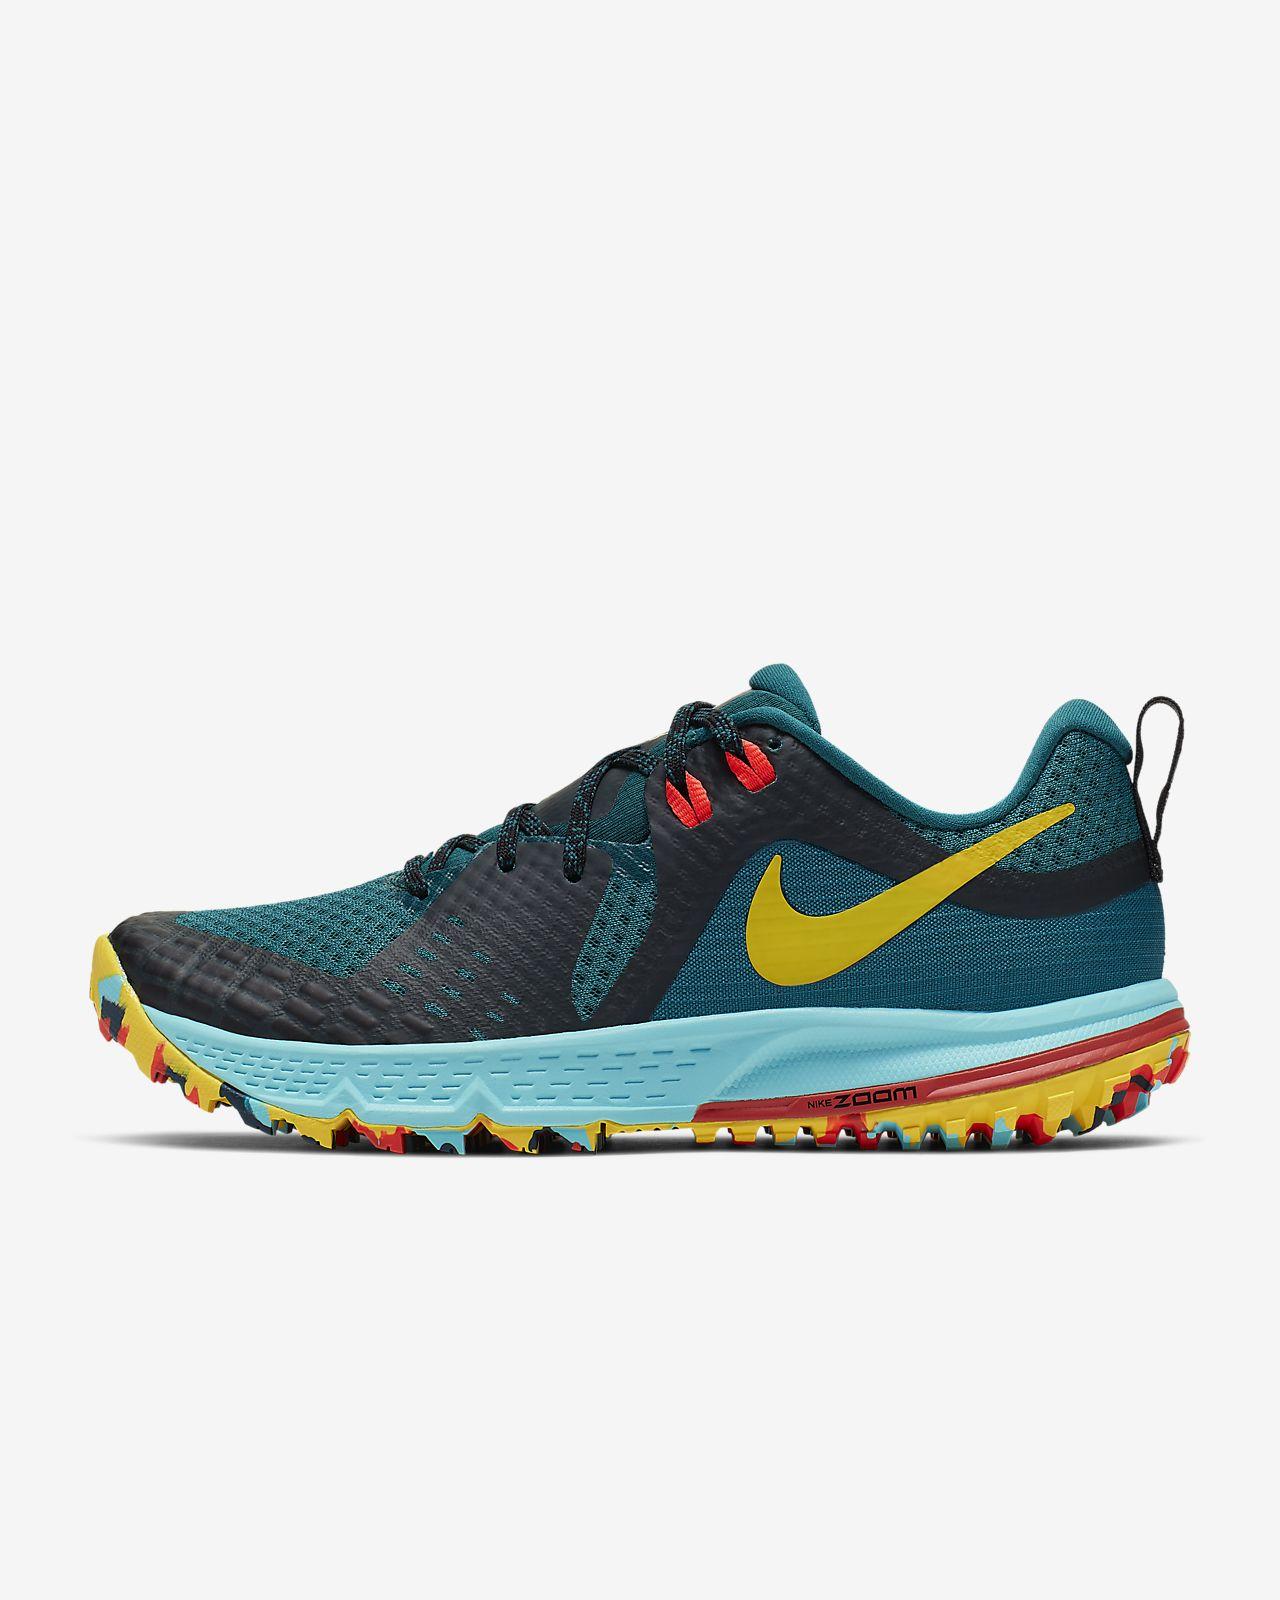 Löparsko Nike Air Zoom Wildhorse 5 för kvinnor